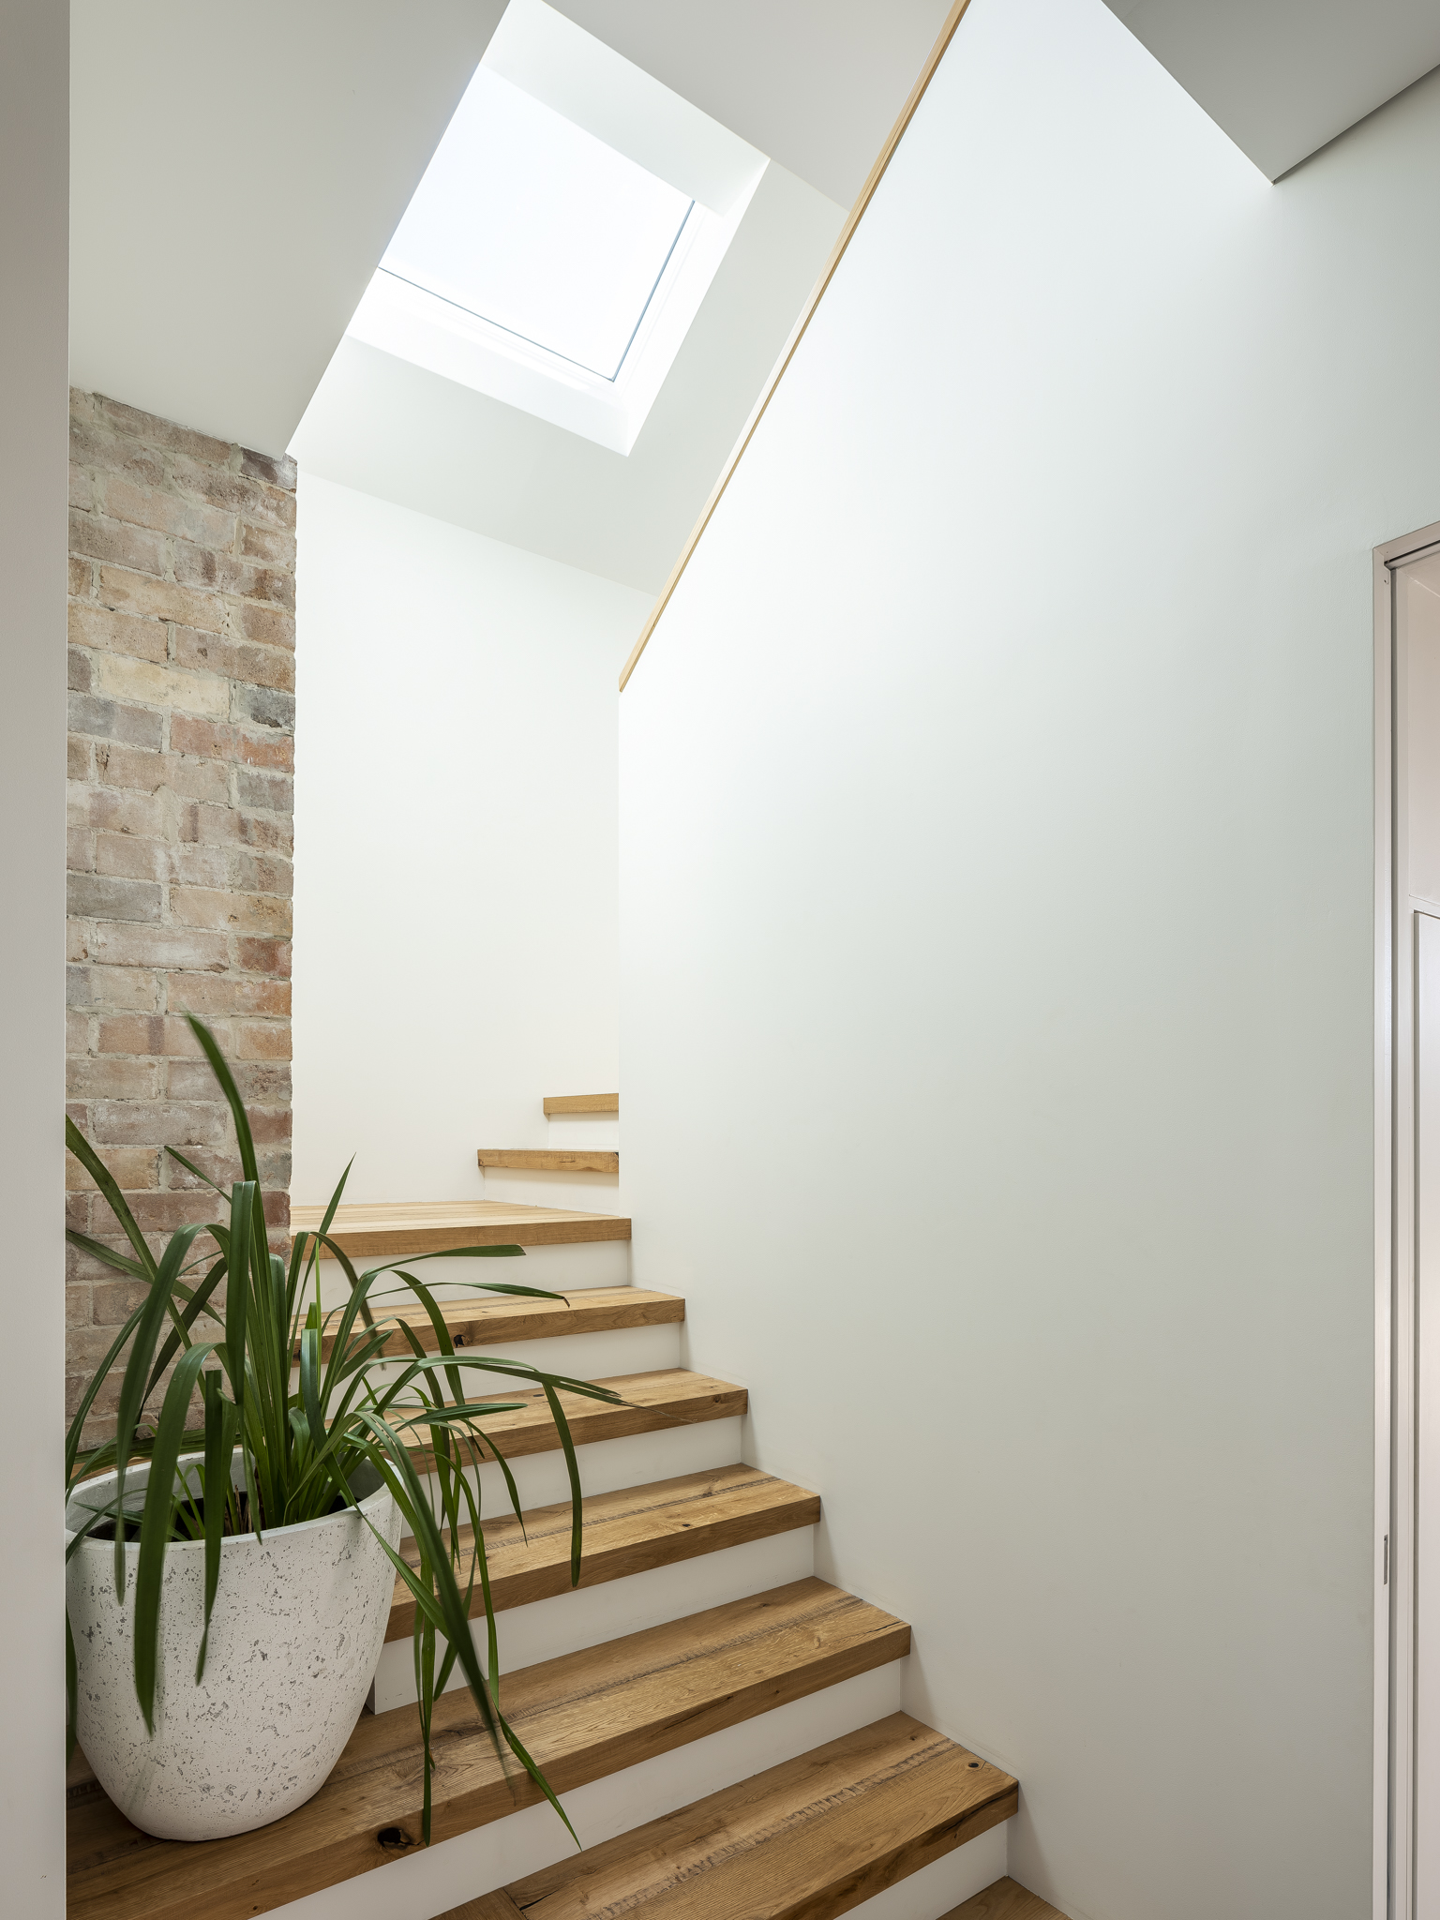 T&D House – Manly Heritage, Archisoul, Sydney Architects